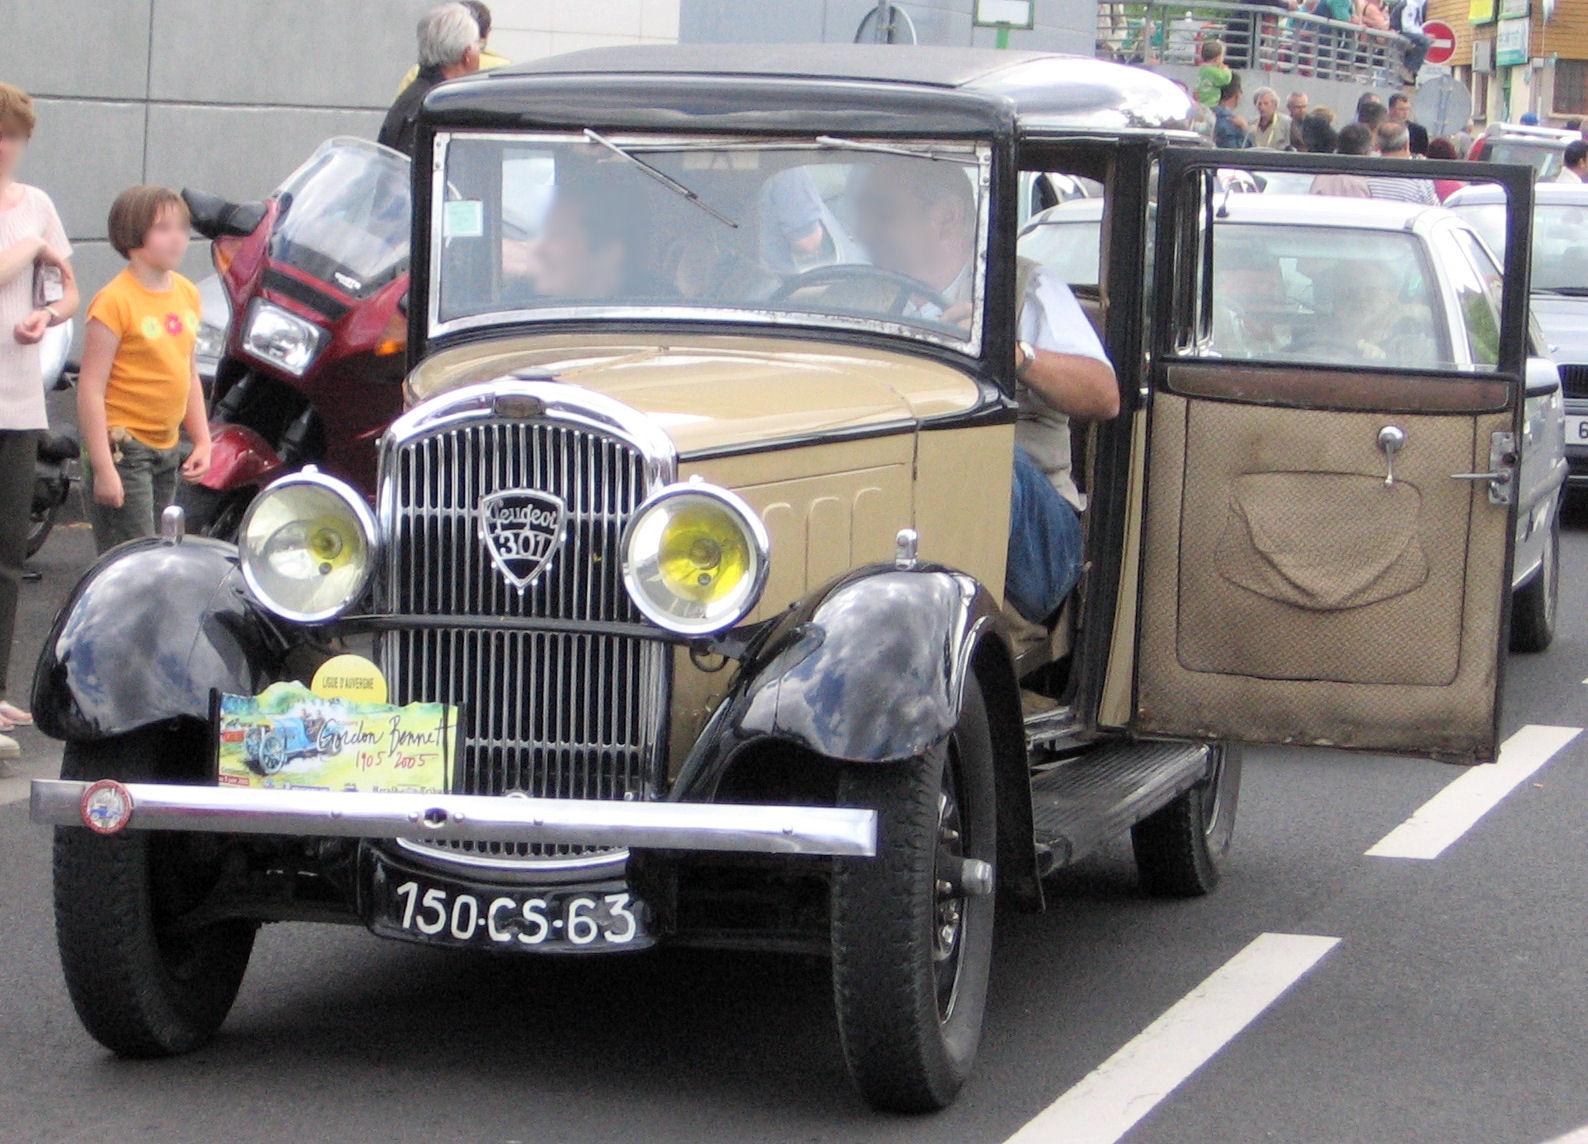 http://upload.wikimedia.org/wikipedia/commons/3/35/Peugeot_301_door.jpg